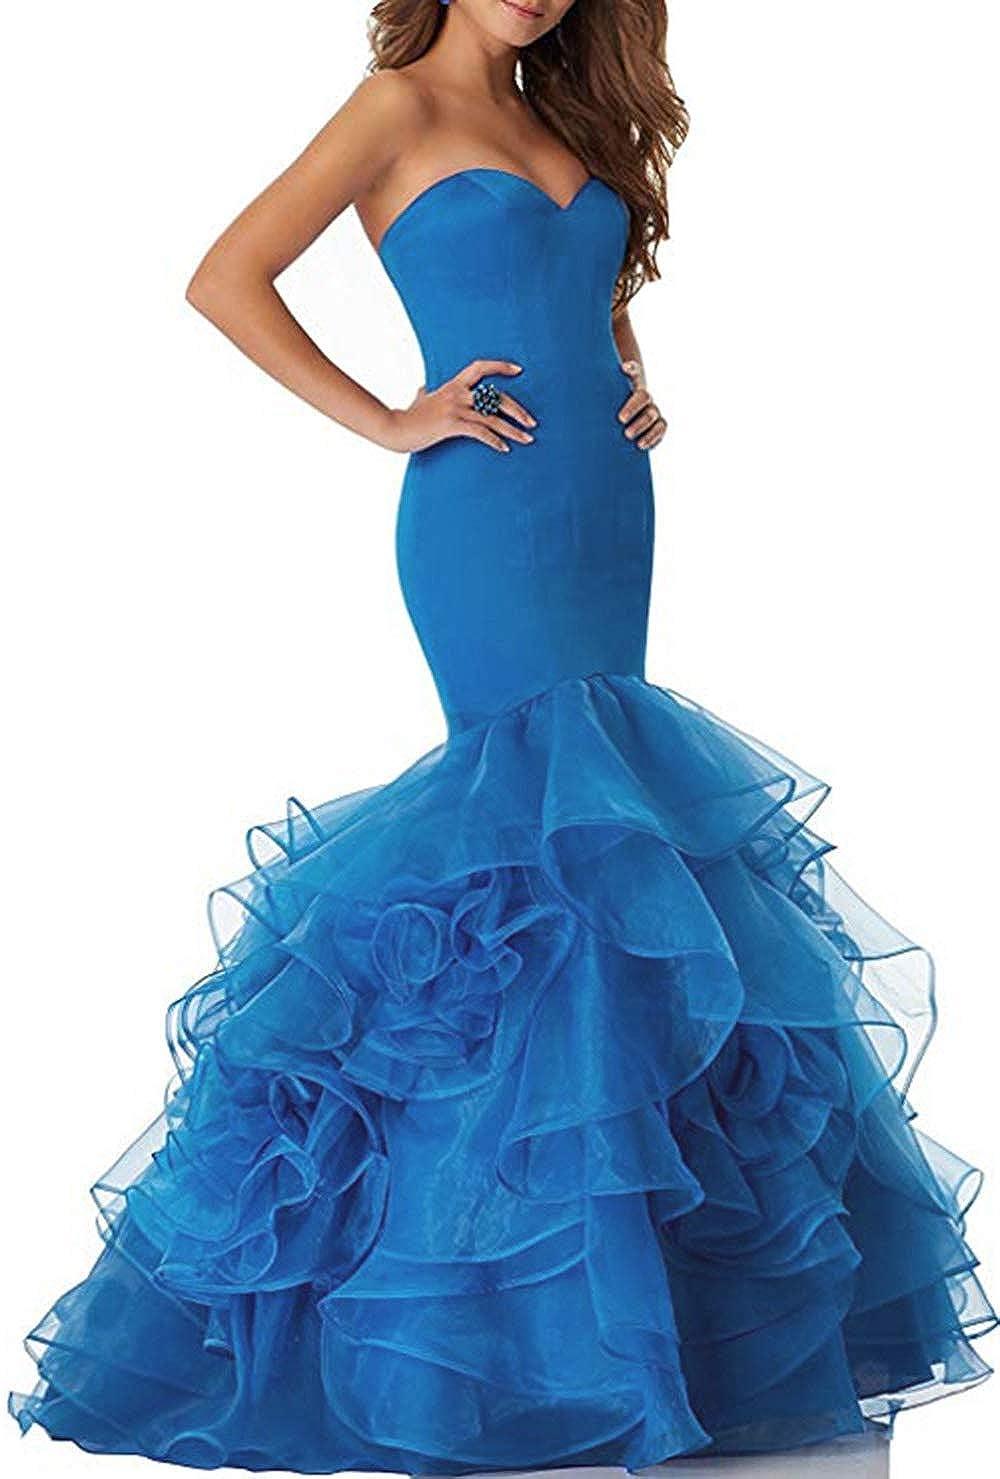 bluee Women's Sweetheart Mermaid Prom Dresses Long Strapless Ruffle Organza Formal Evening Ball Gowns 2019